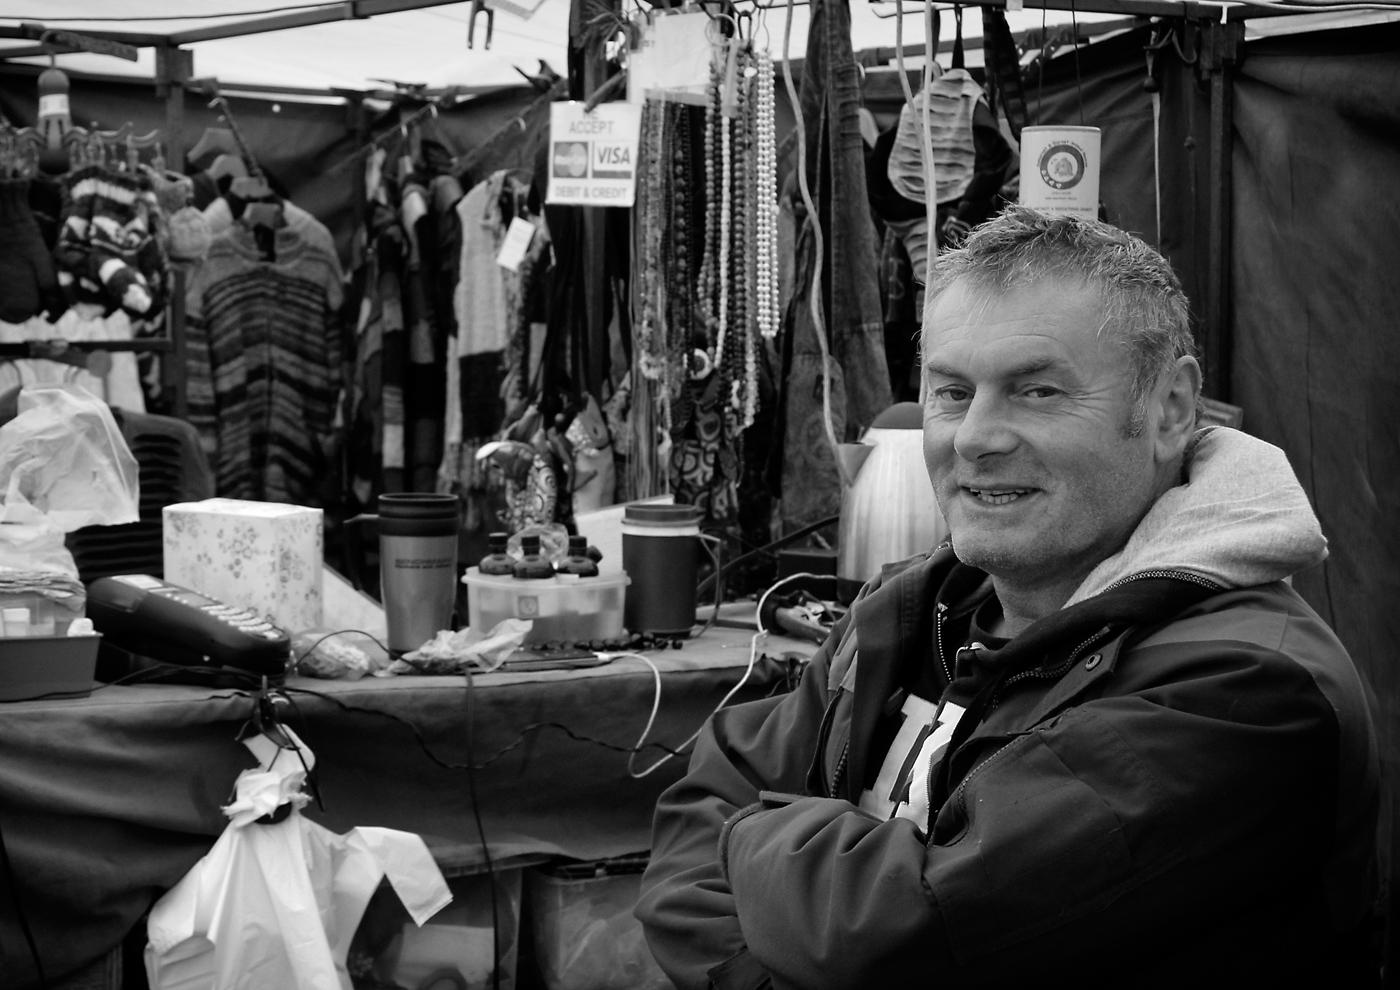 Market Trader 02 by Tony Oliver